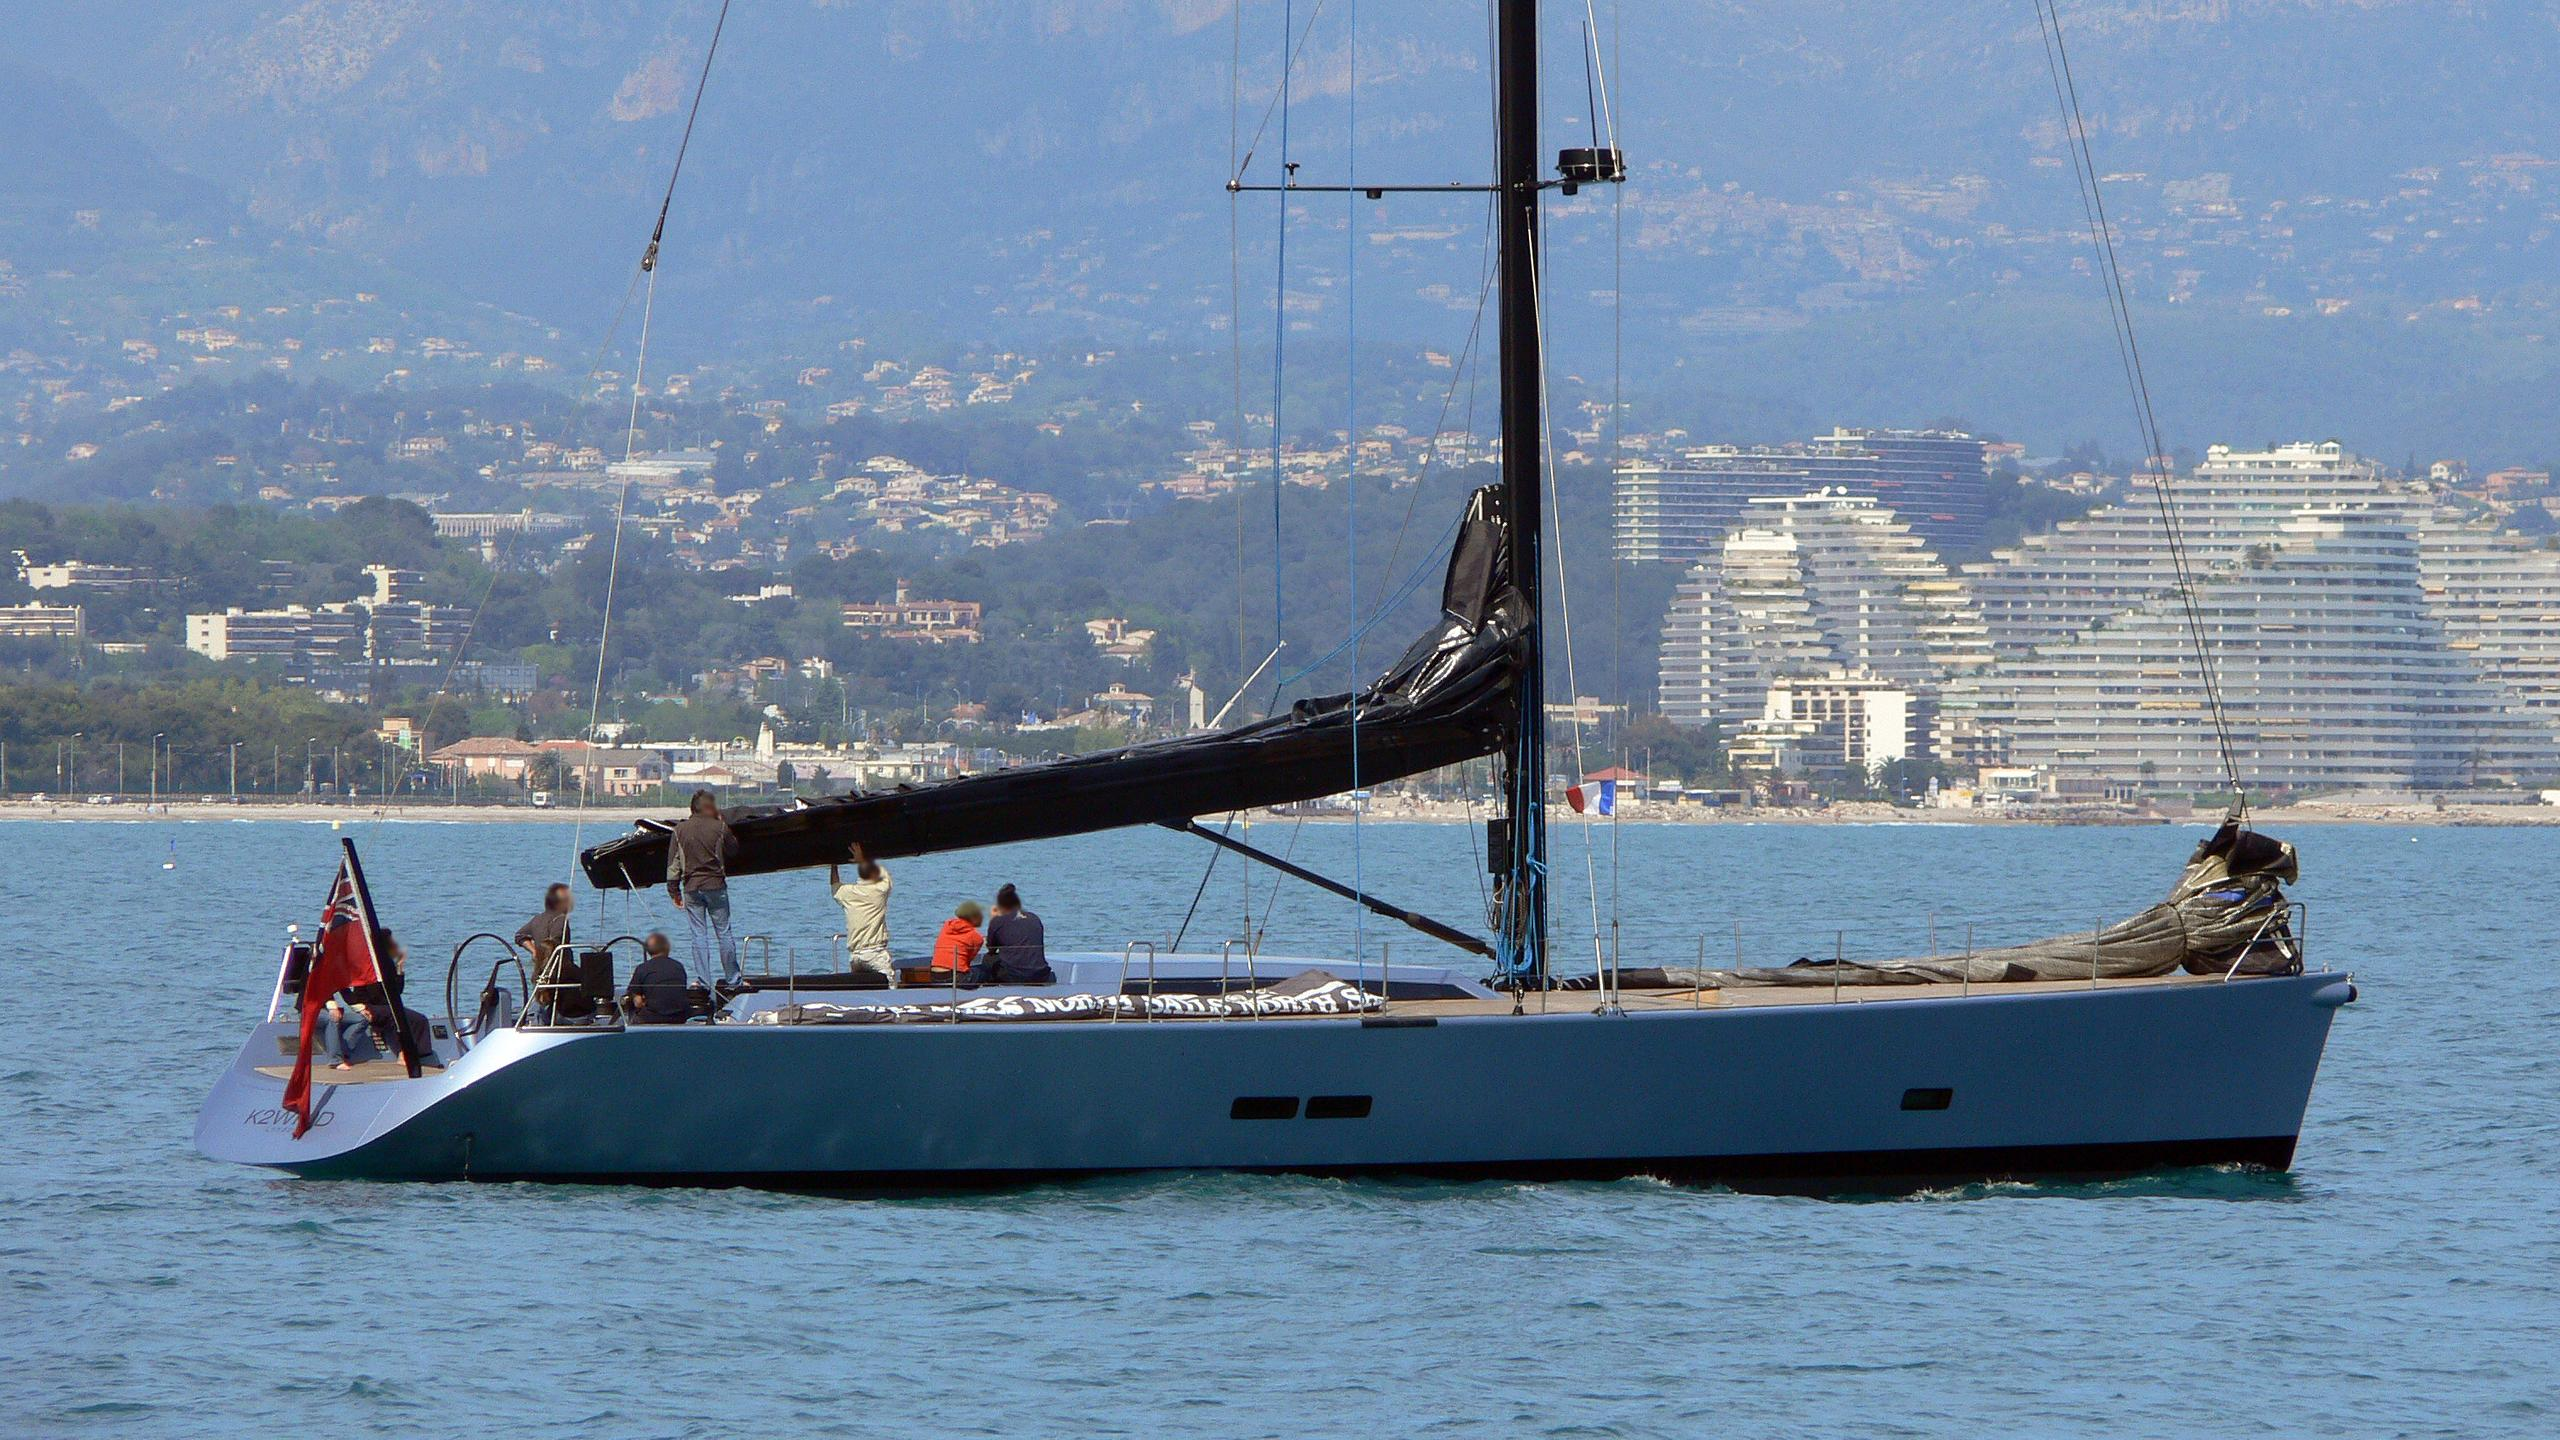 k2wind-sailing-yacht-wally-77-fr-2000-24m-profile